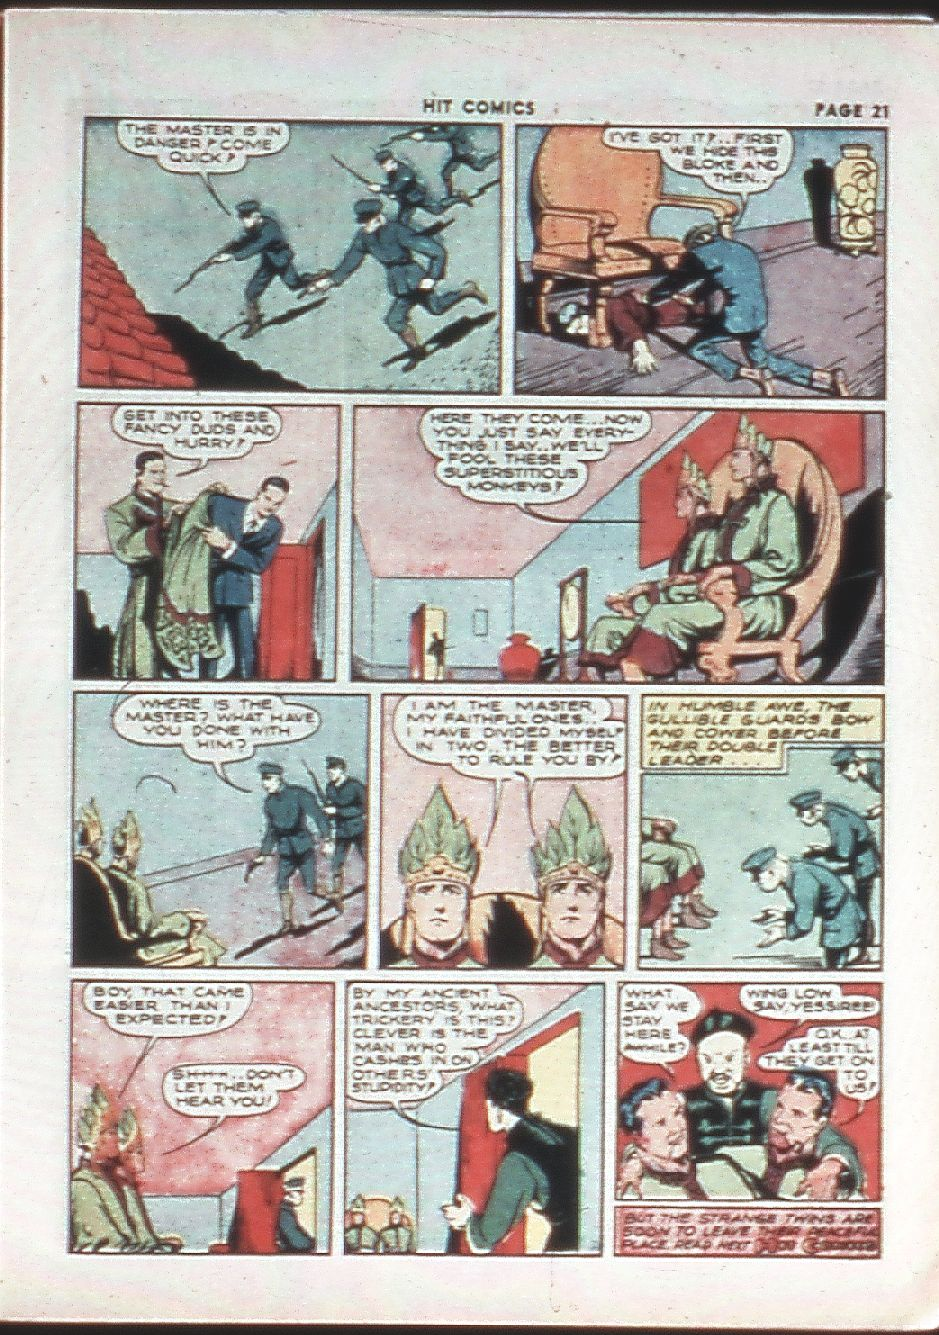 Read online Hit Comics comic -  Issue #10 - 23